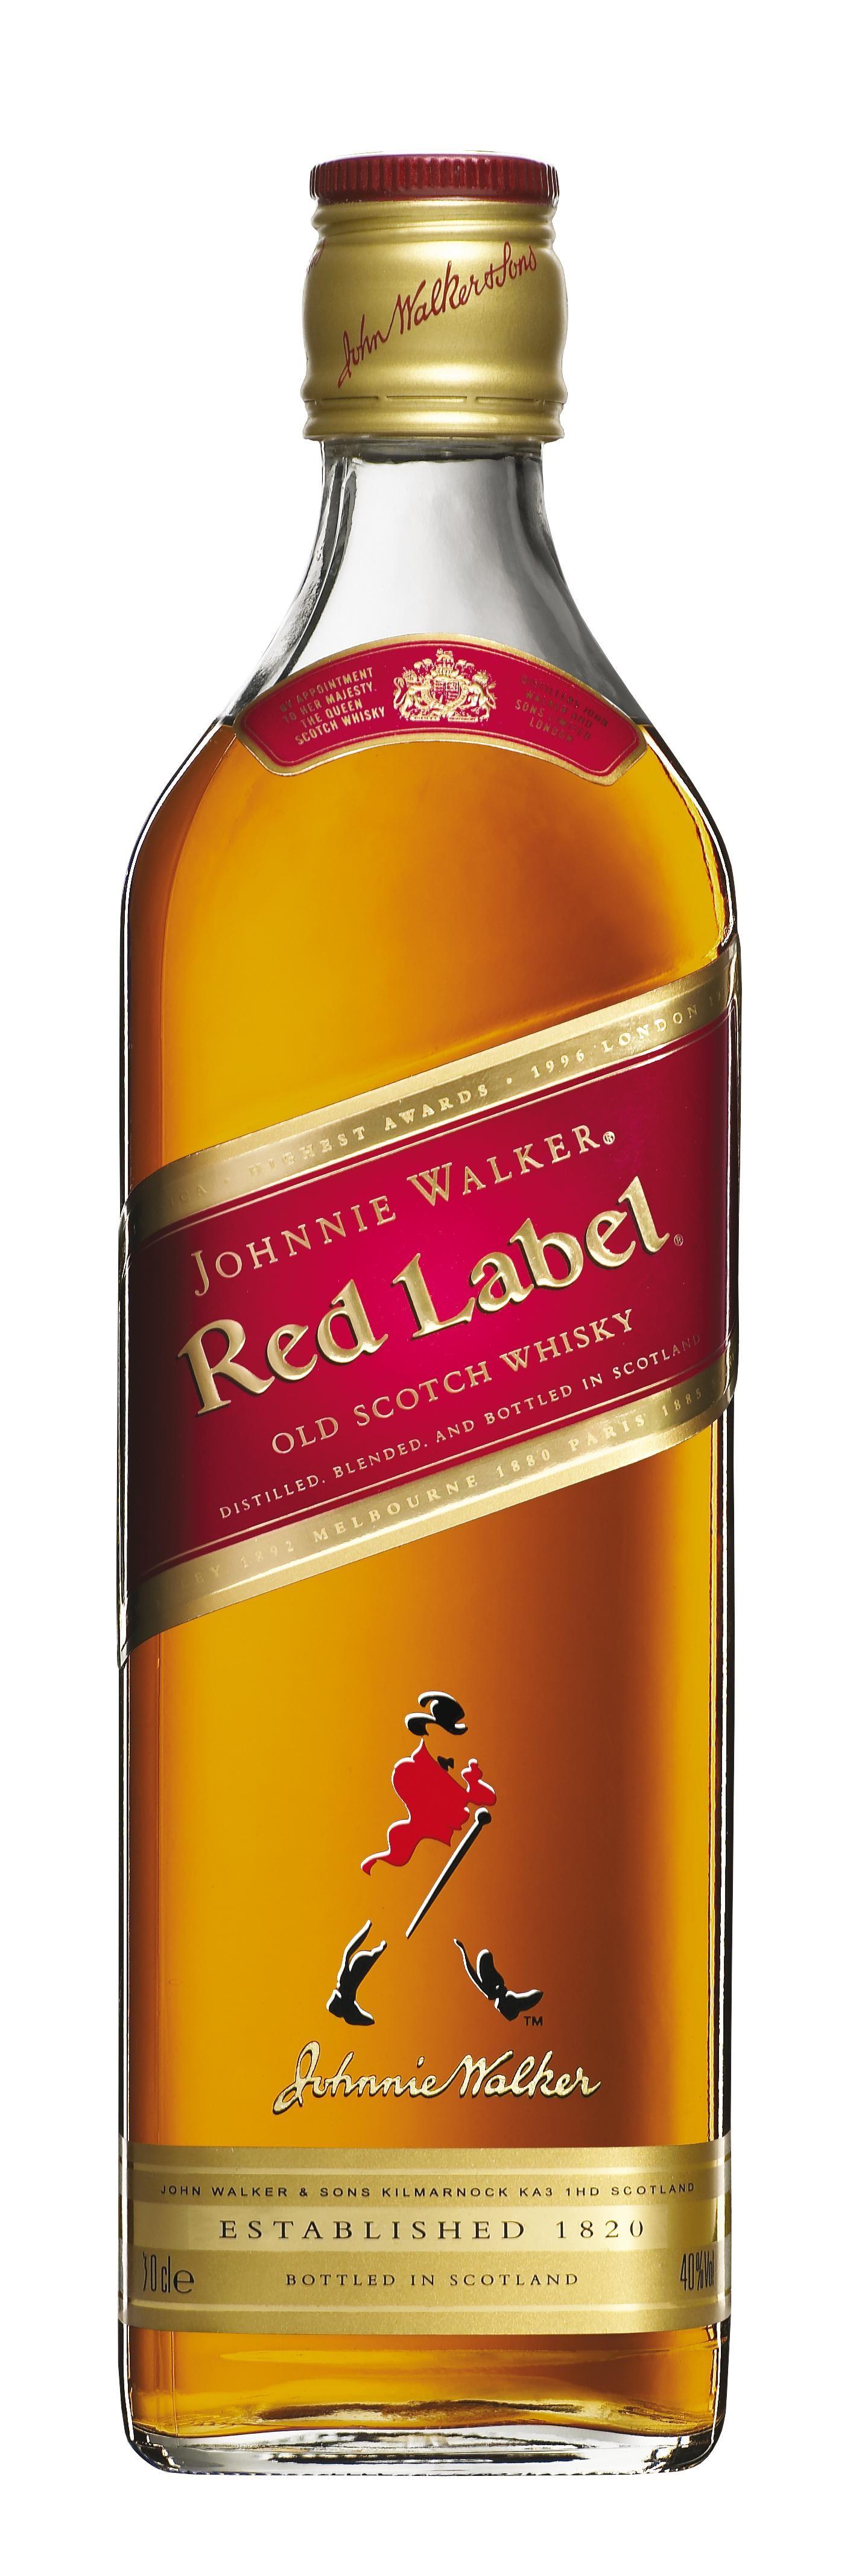 Johnnie Walker Red Label 70cl 40% Blended Scotch Whisky